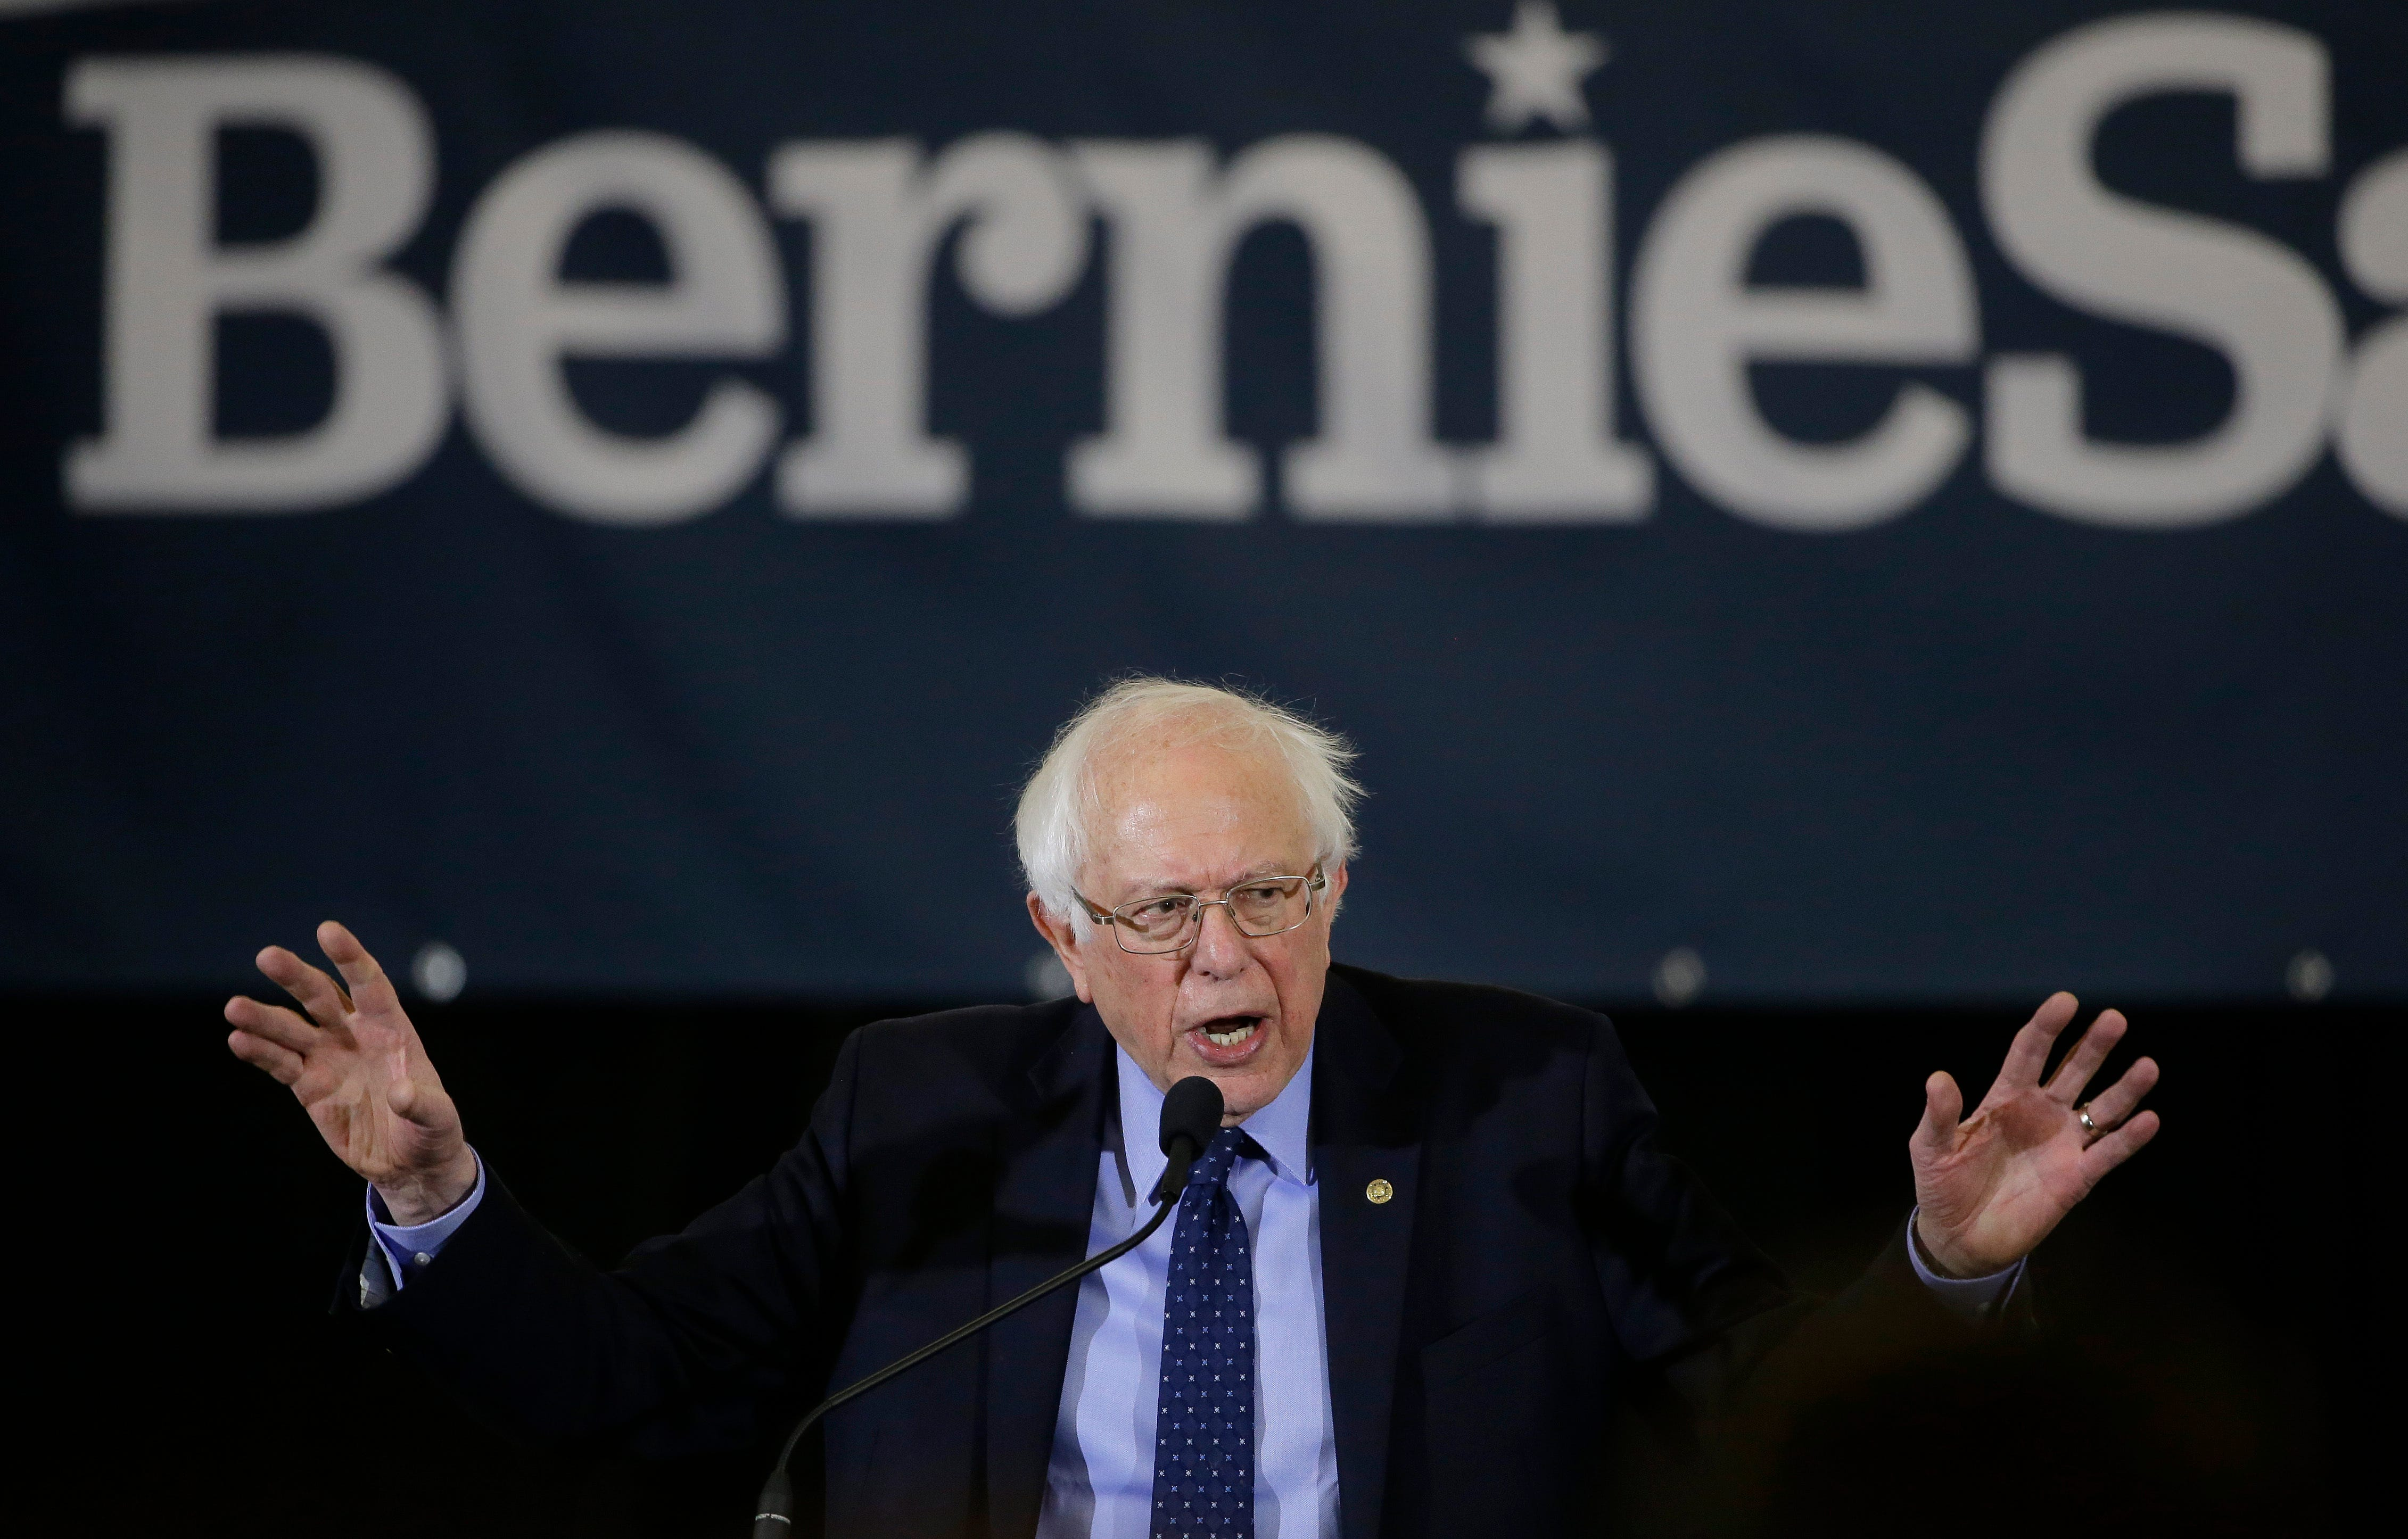 Donald Trump attacks Bernie Sanders' tax returns, makes 2020 election prediction